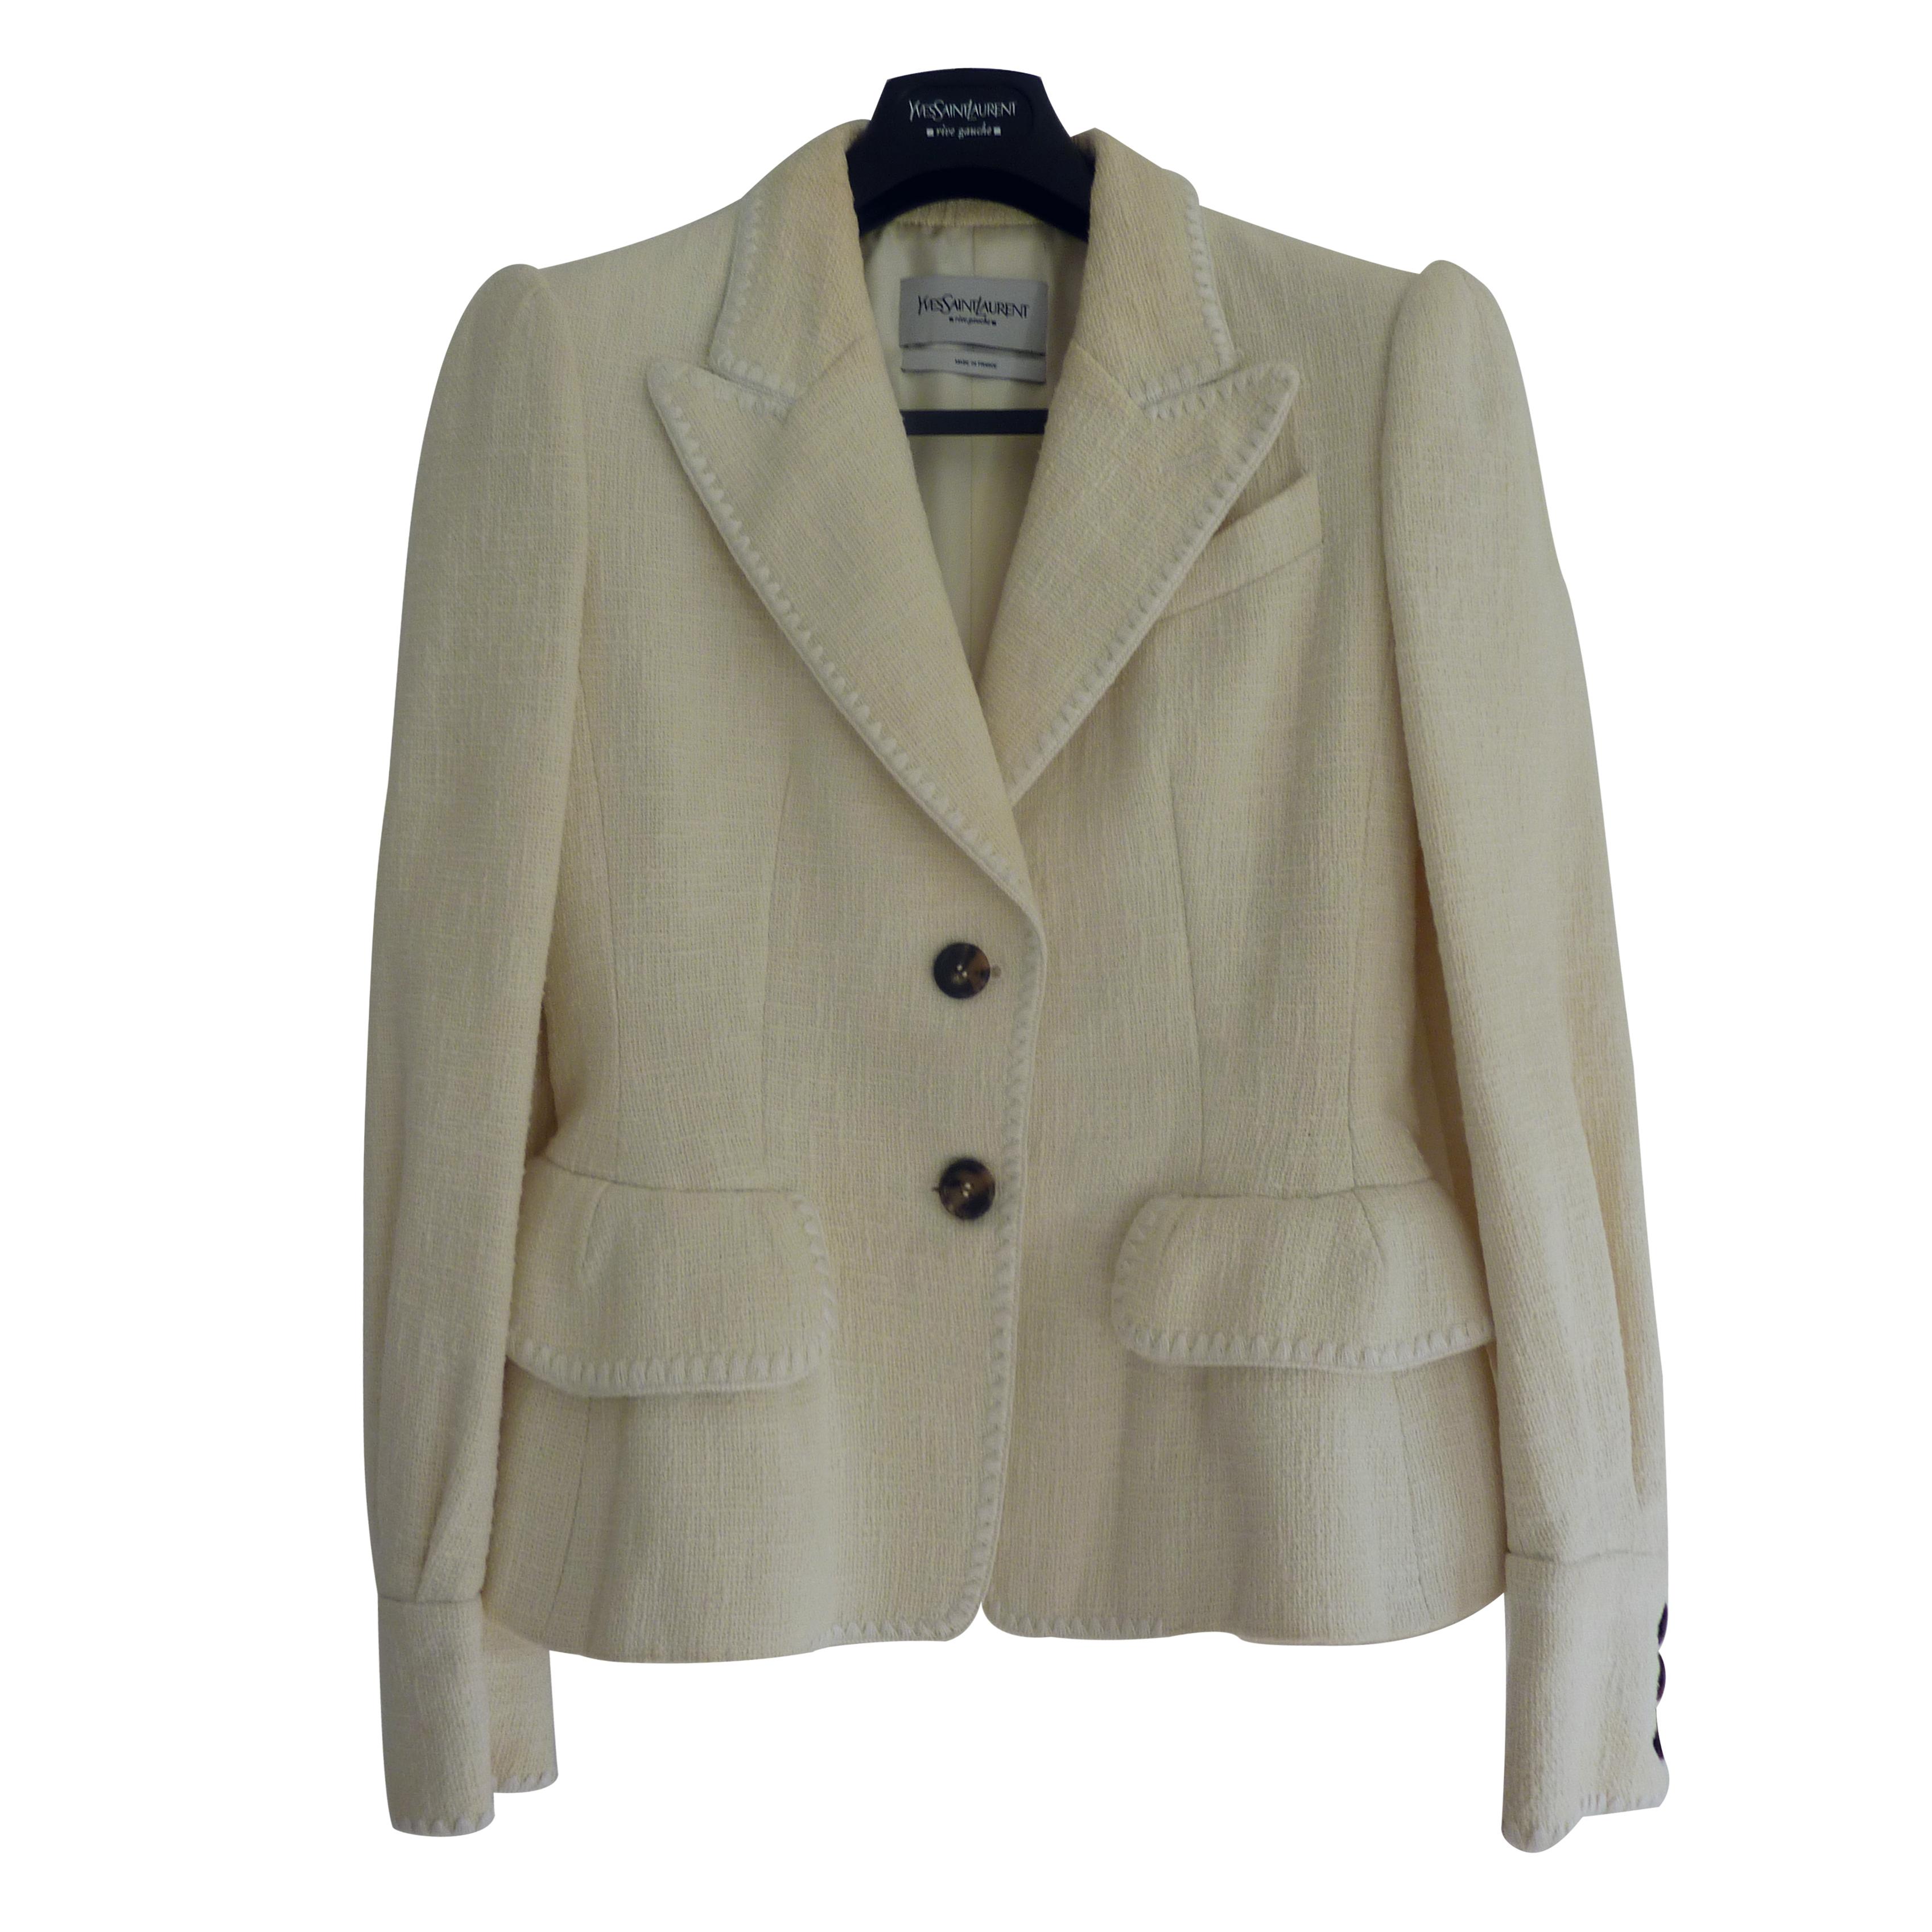 8322f73bde0 Yves Saint Laurent Rive Gauche Cream Jacket038186 | HEWI London